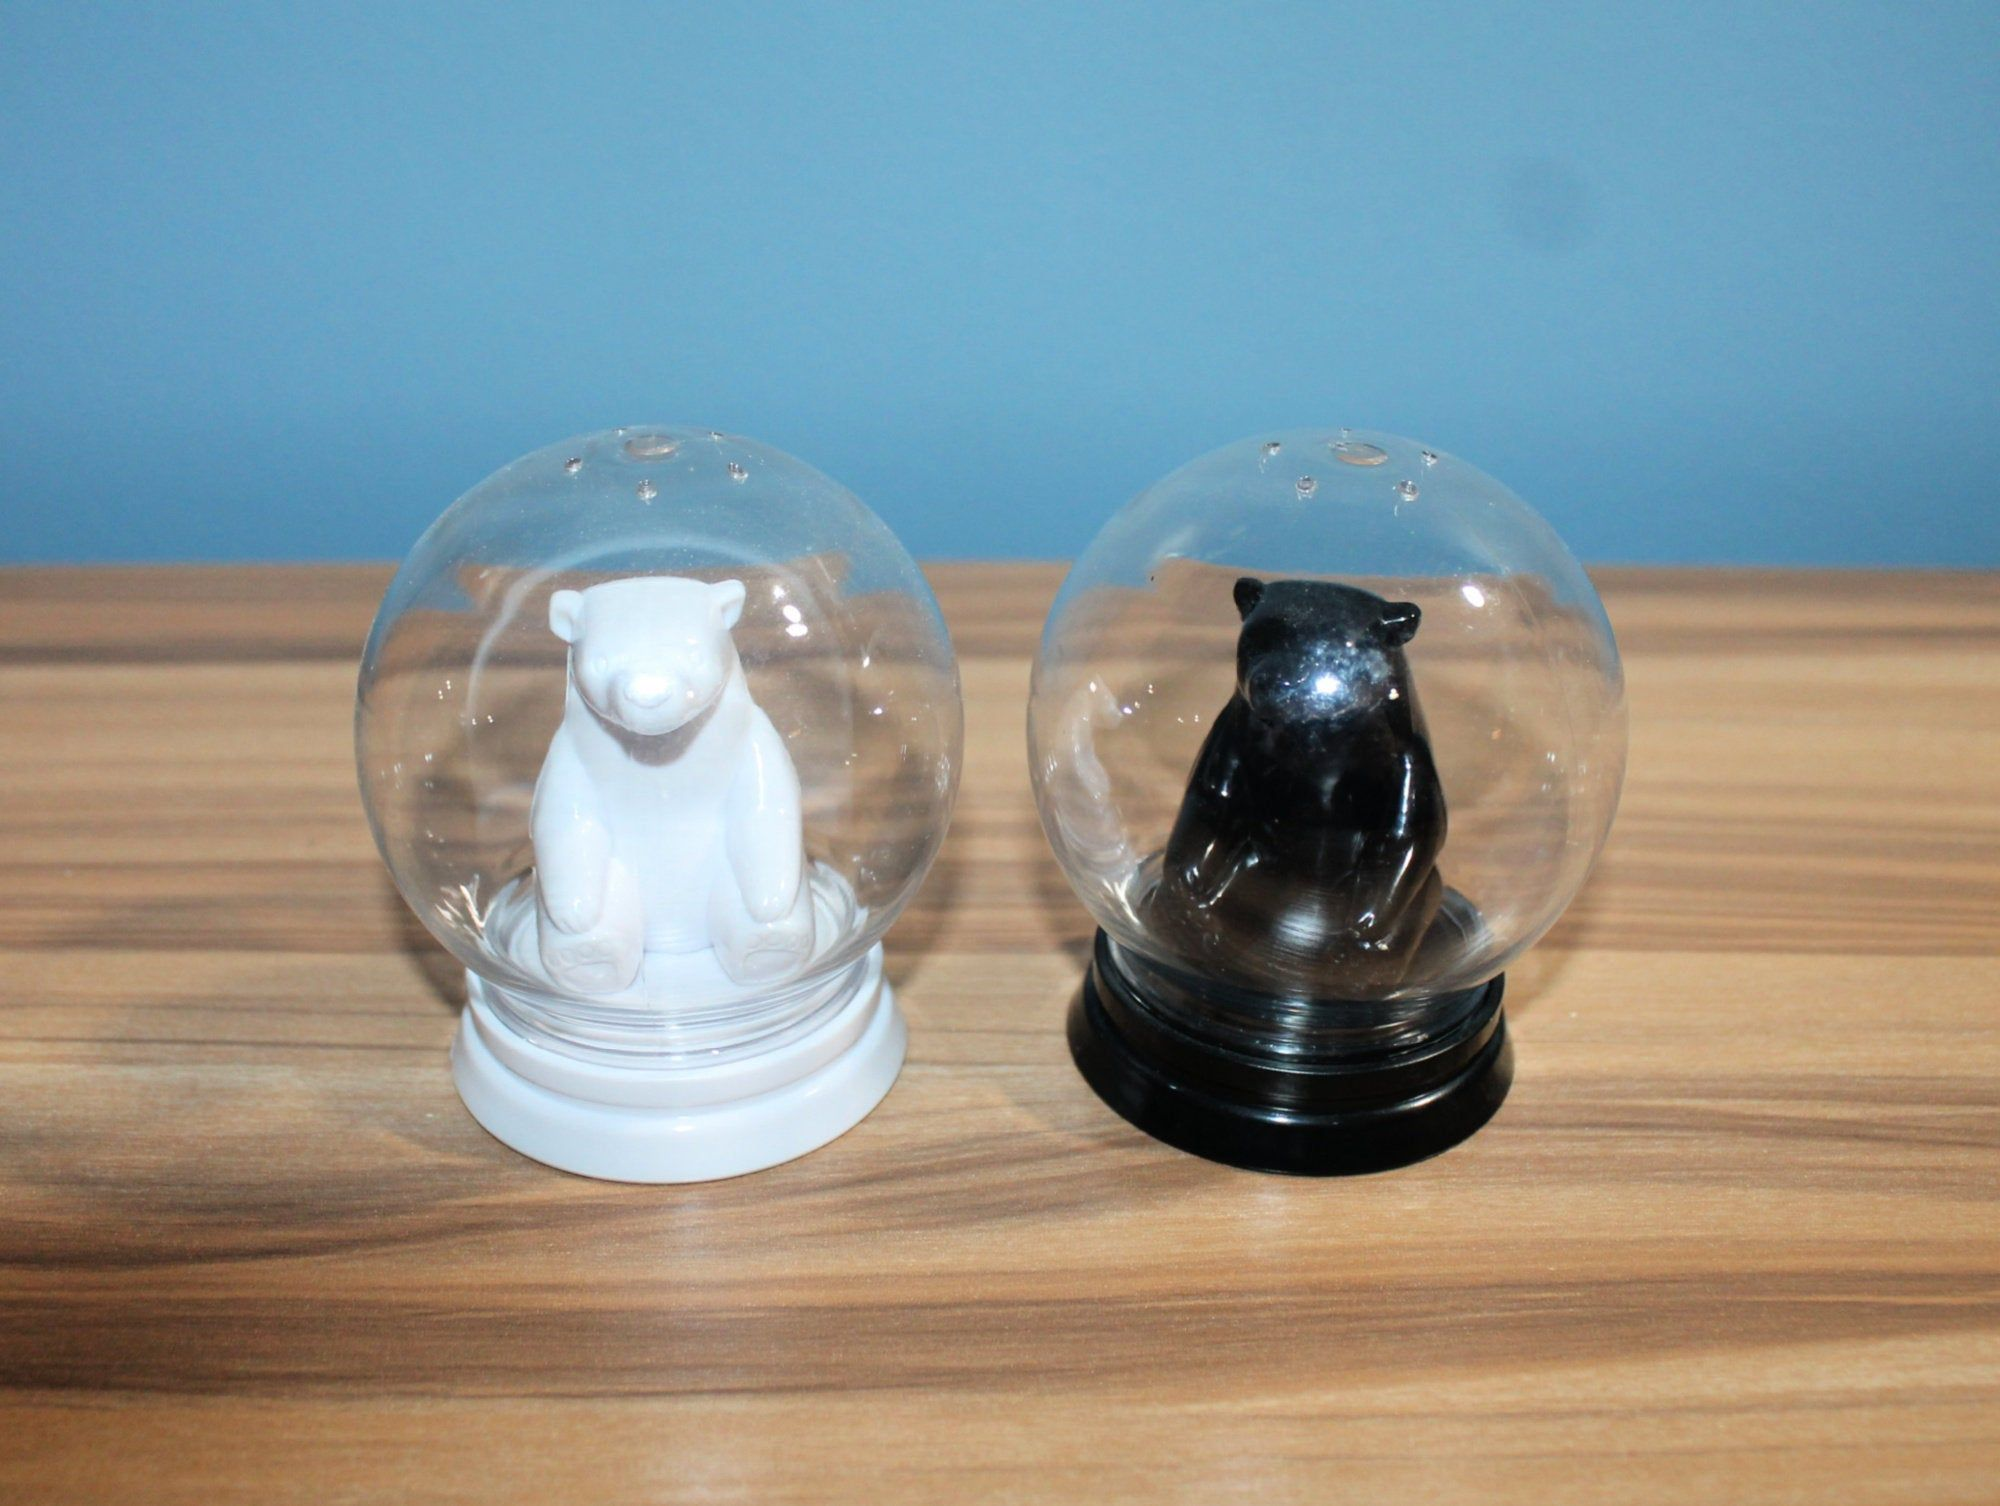 Unique Set Of Bear Snow Globe Salt And Pepper Shakers Polar Etsy In 2021 Snow Globes White Polar Bear Shakers